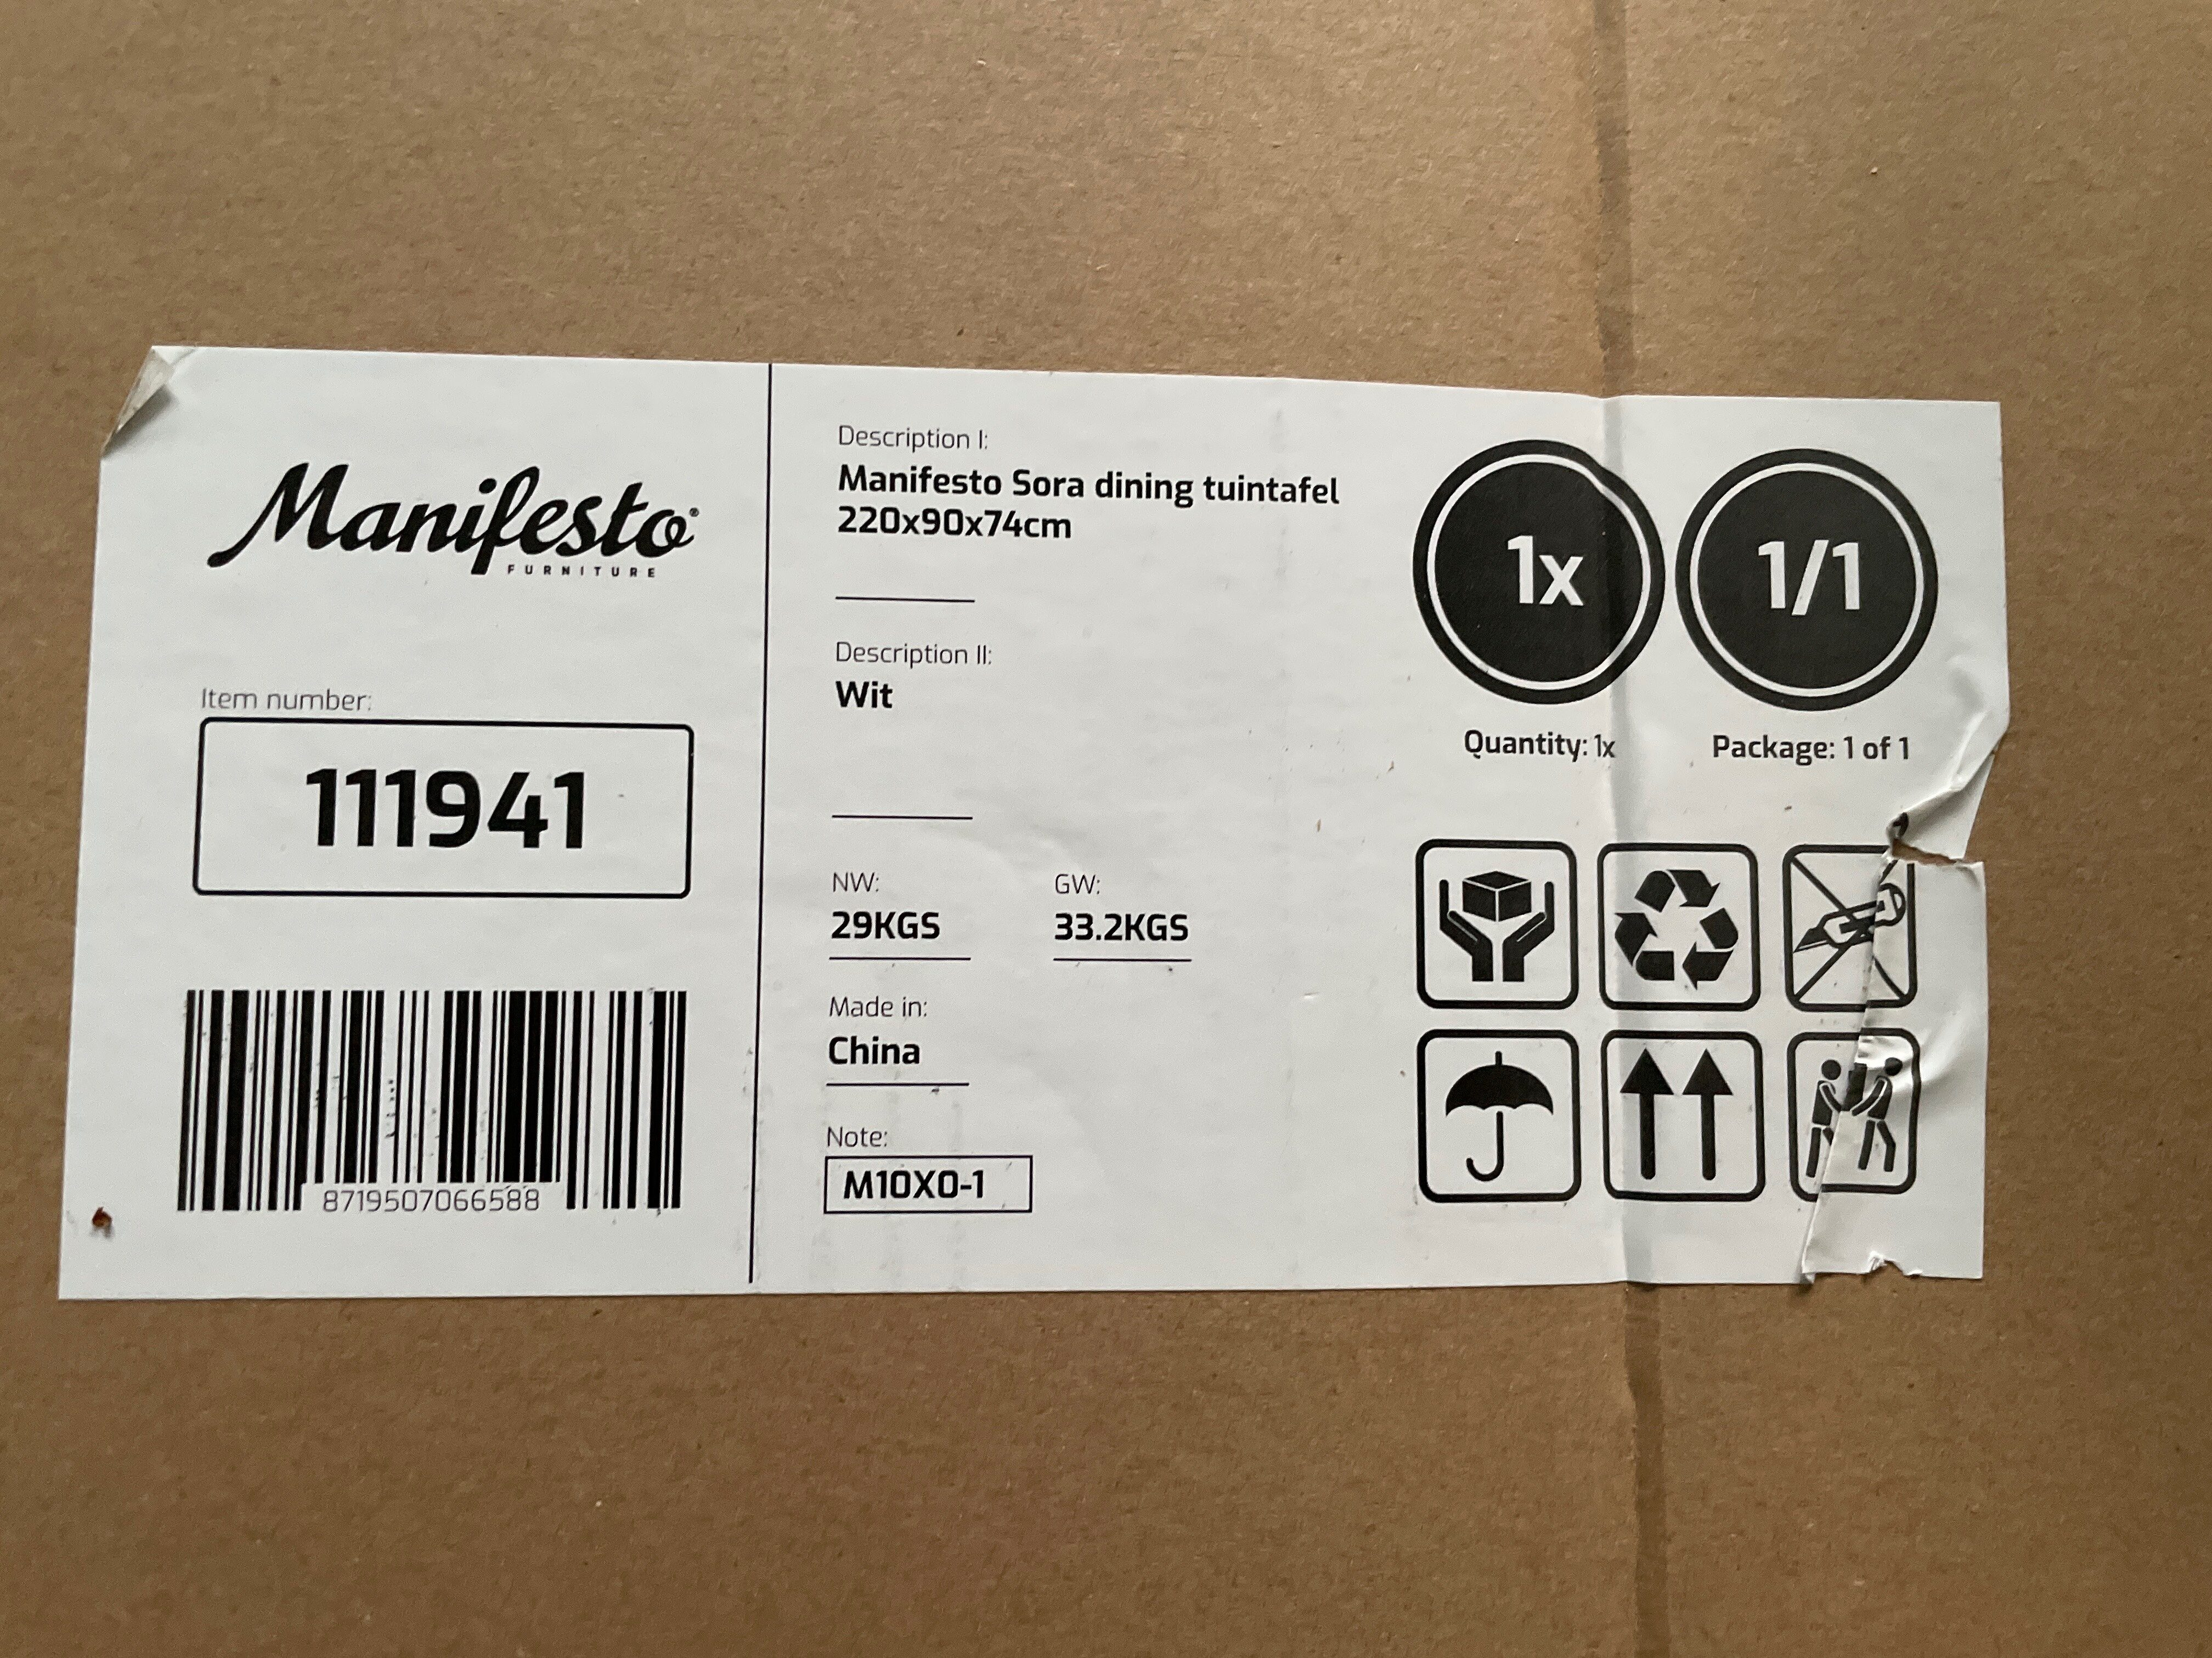 Manifesto Sora dining tuintafel - Product - de